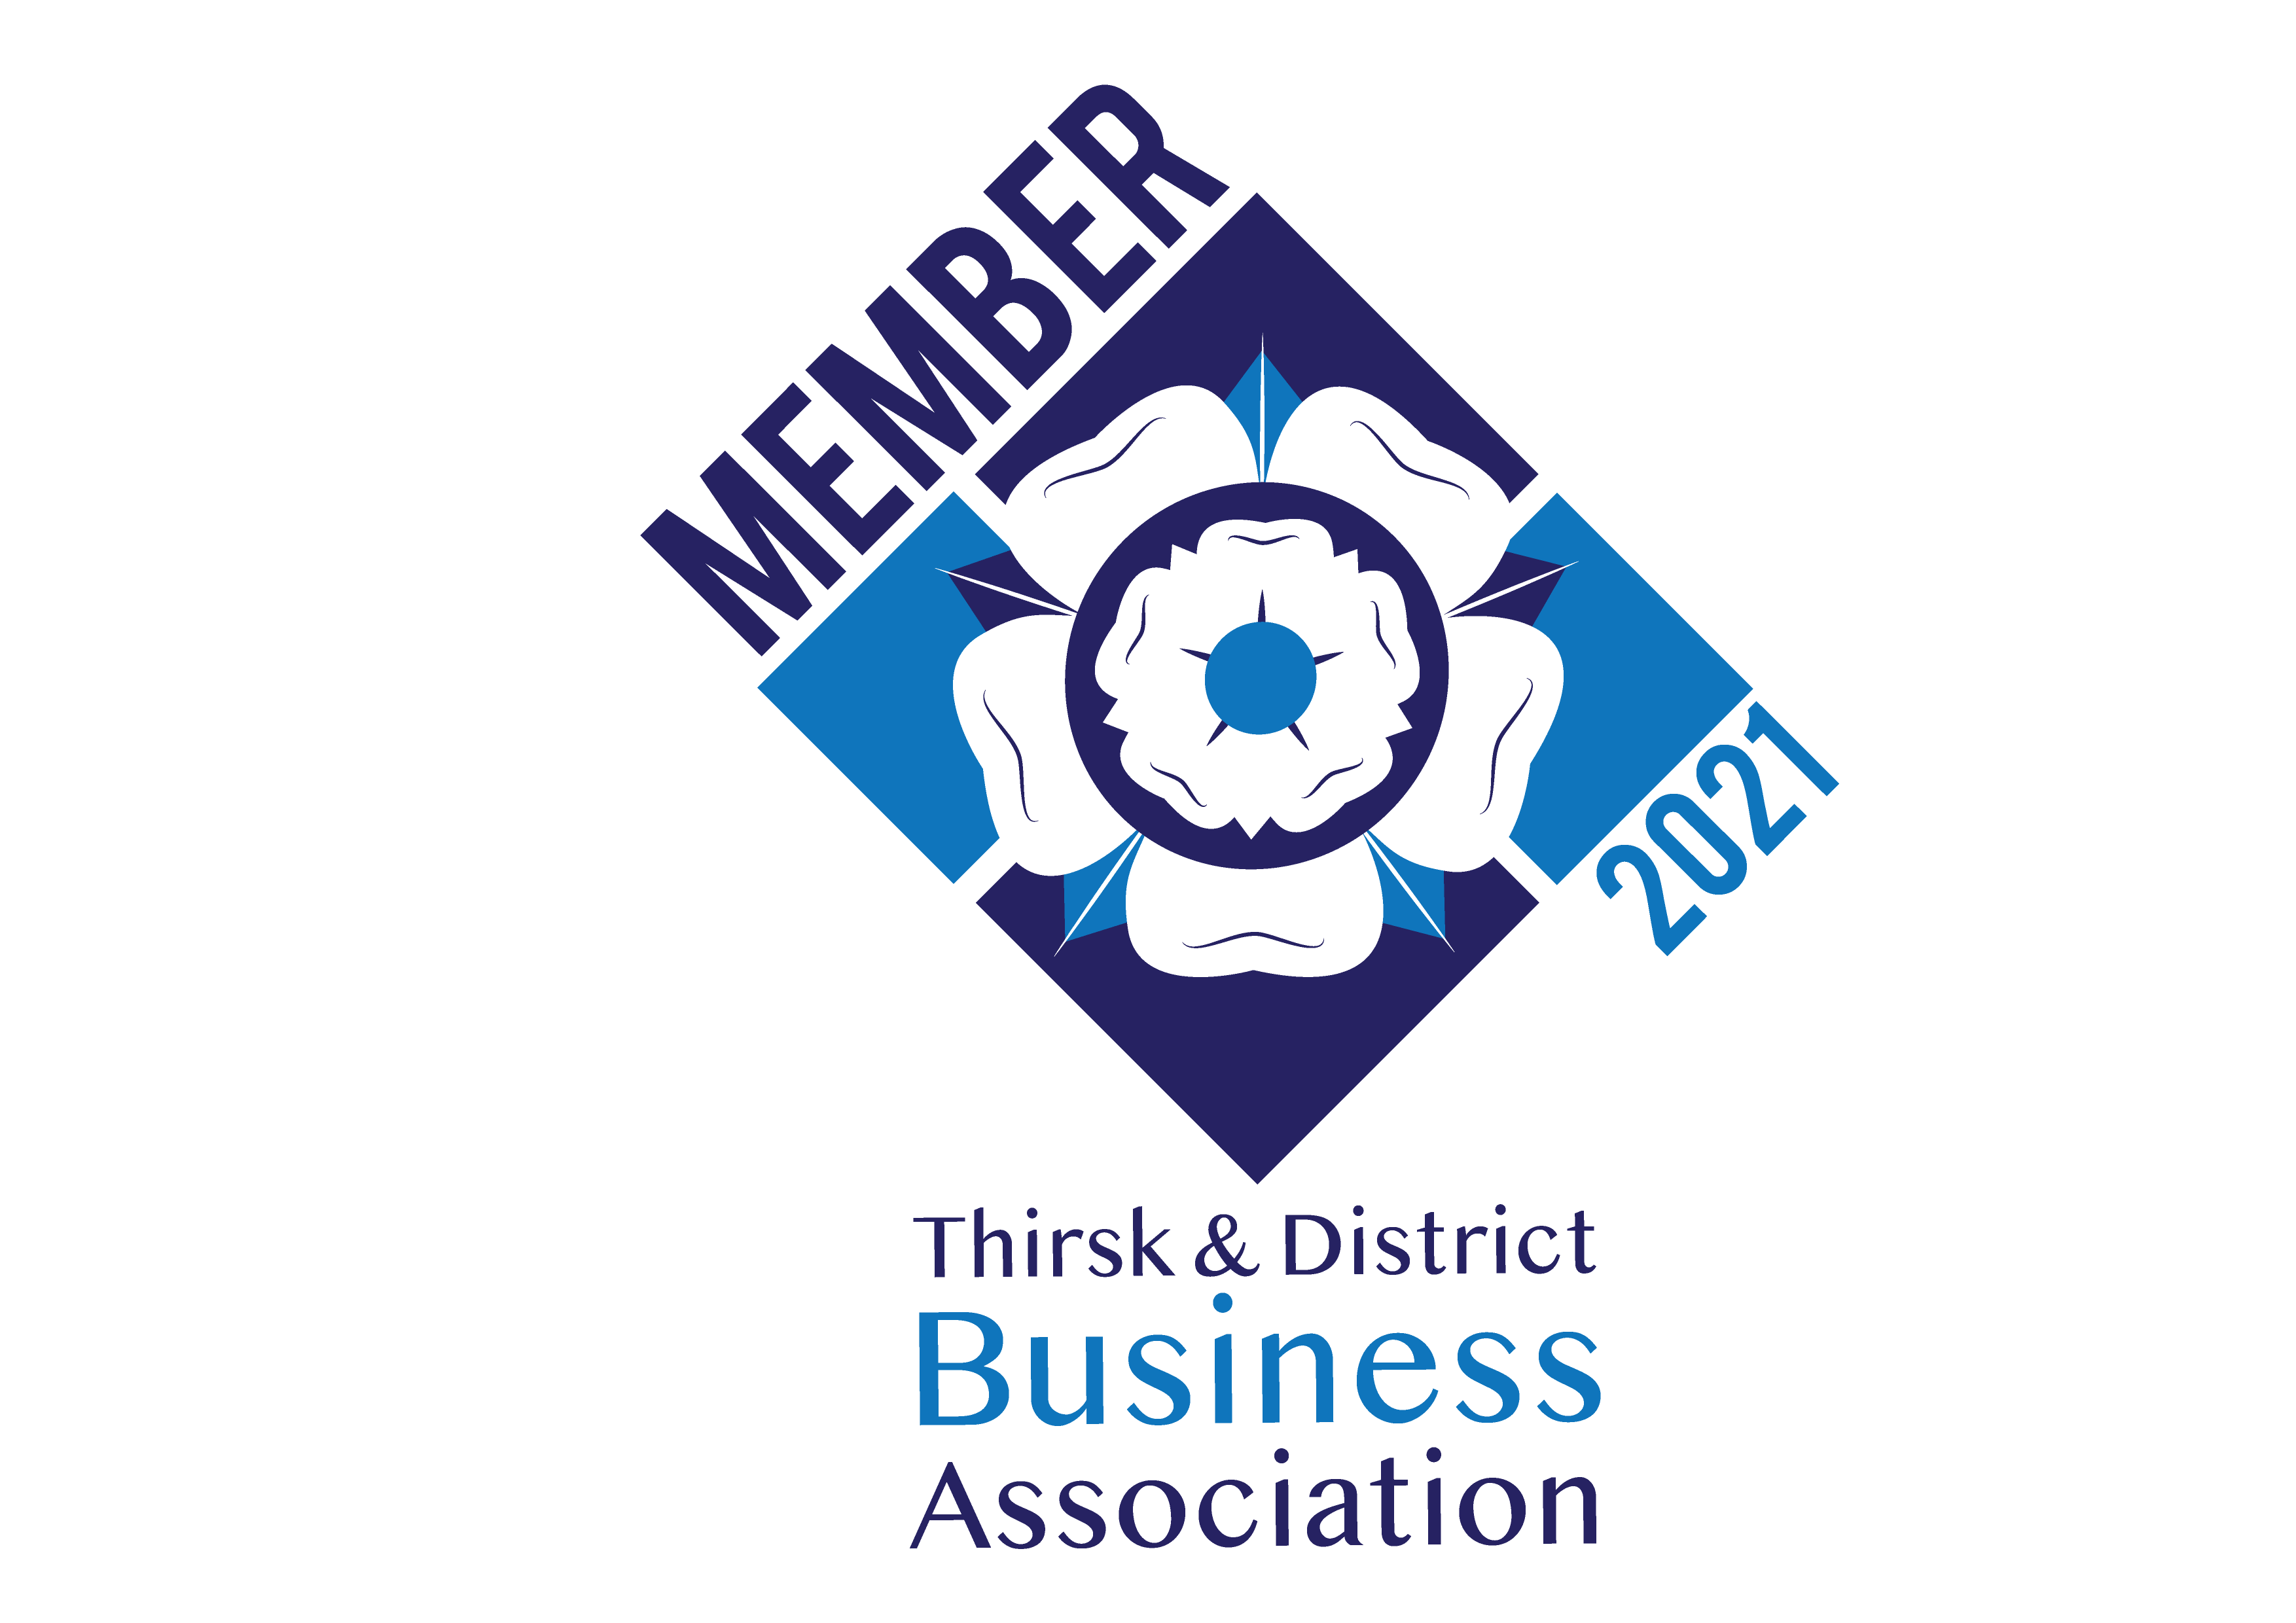 Thirsk & District Business Association Member, Thirsk Copywriter, Yorkshire Copywriter